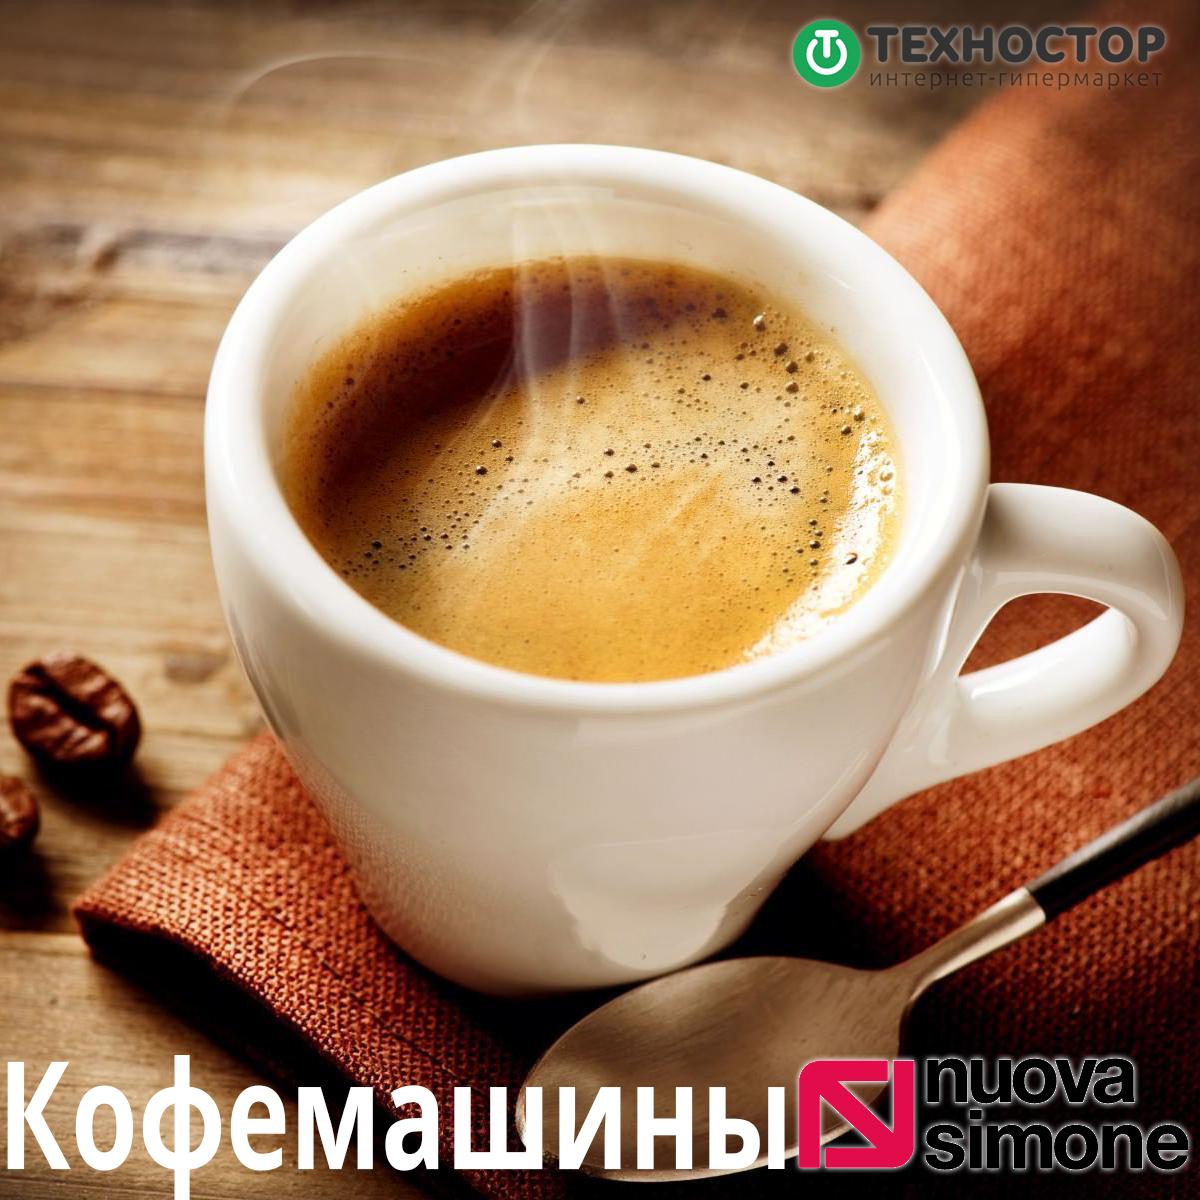 Nuova Simonelli кофемашины